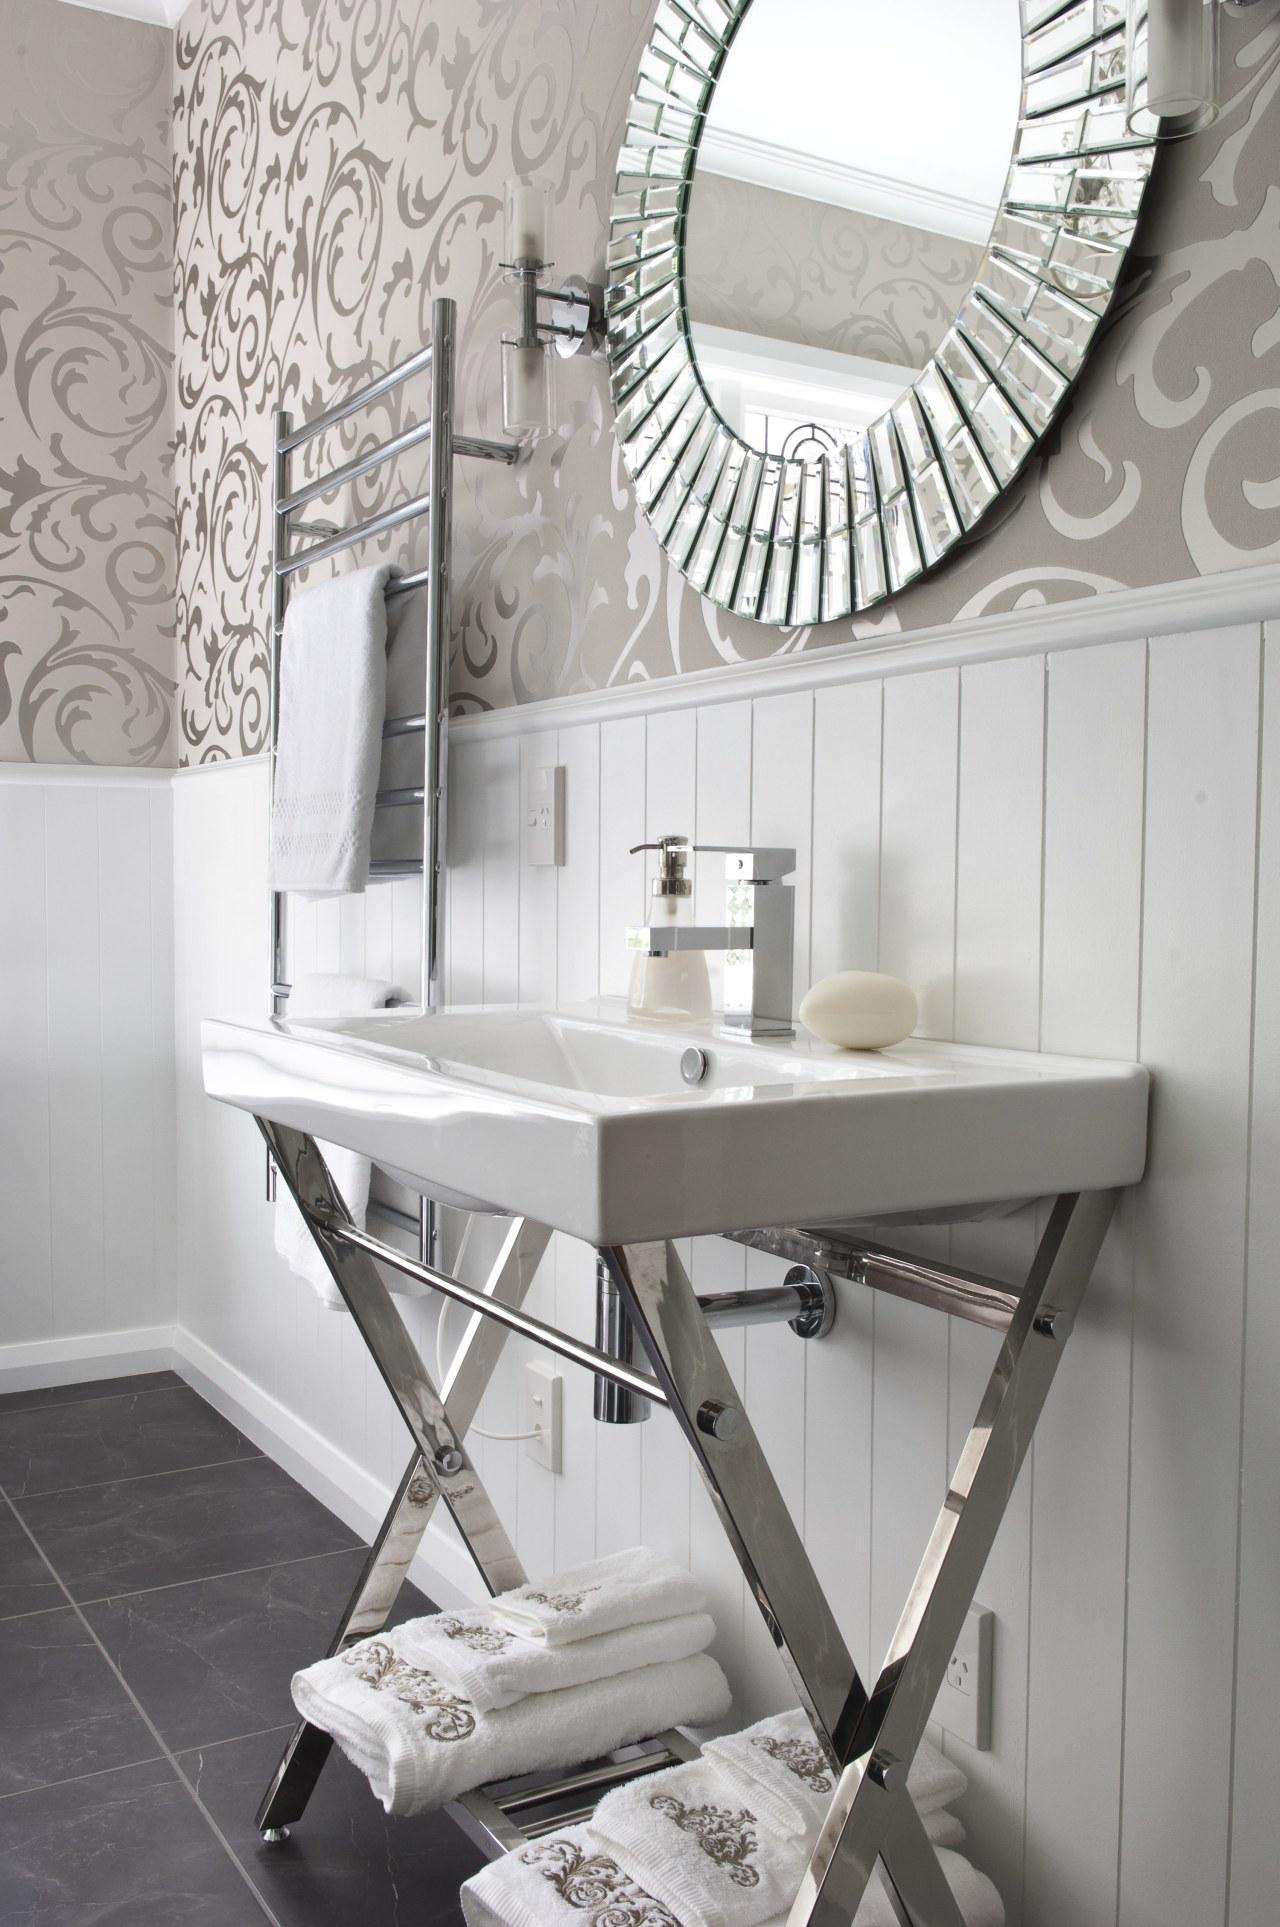 View of bathroom in a 1930s bungalow designed bathroom, bathroom sink, ceramic, floor, flooring, furniture, home, interior design, plumbing fixture, product, product design, sink, table, tap, tile, wall, gray